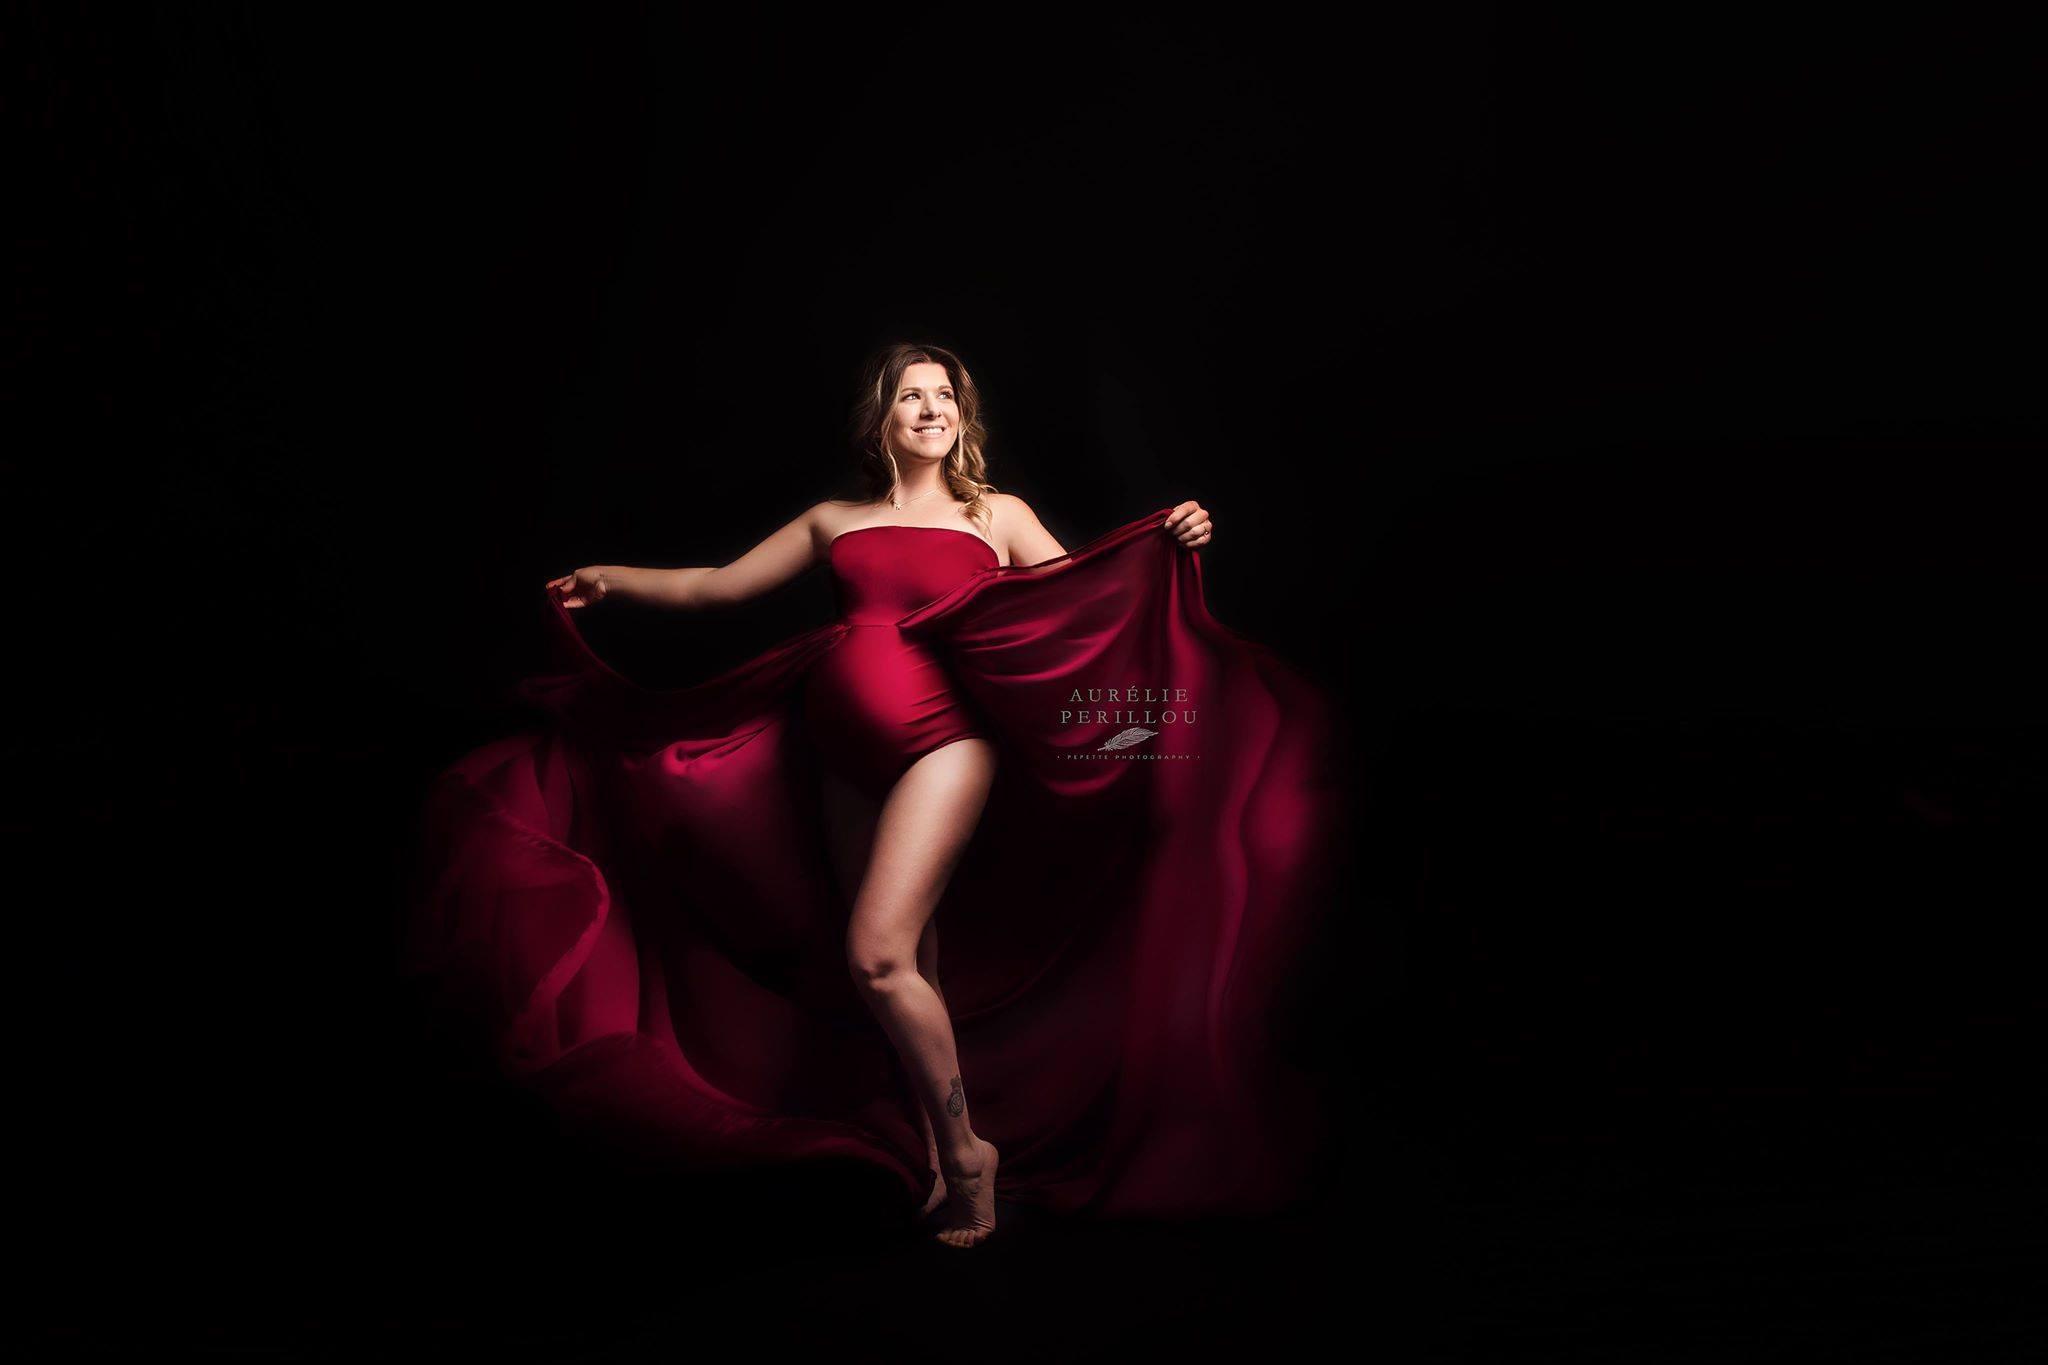 Création robe bodysuit Tulipe for fine art photographies